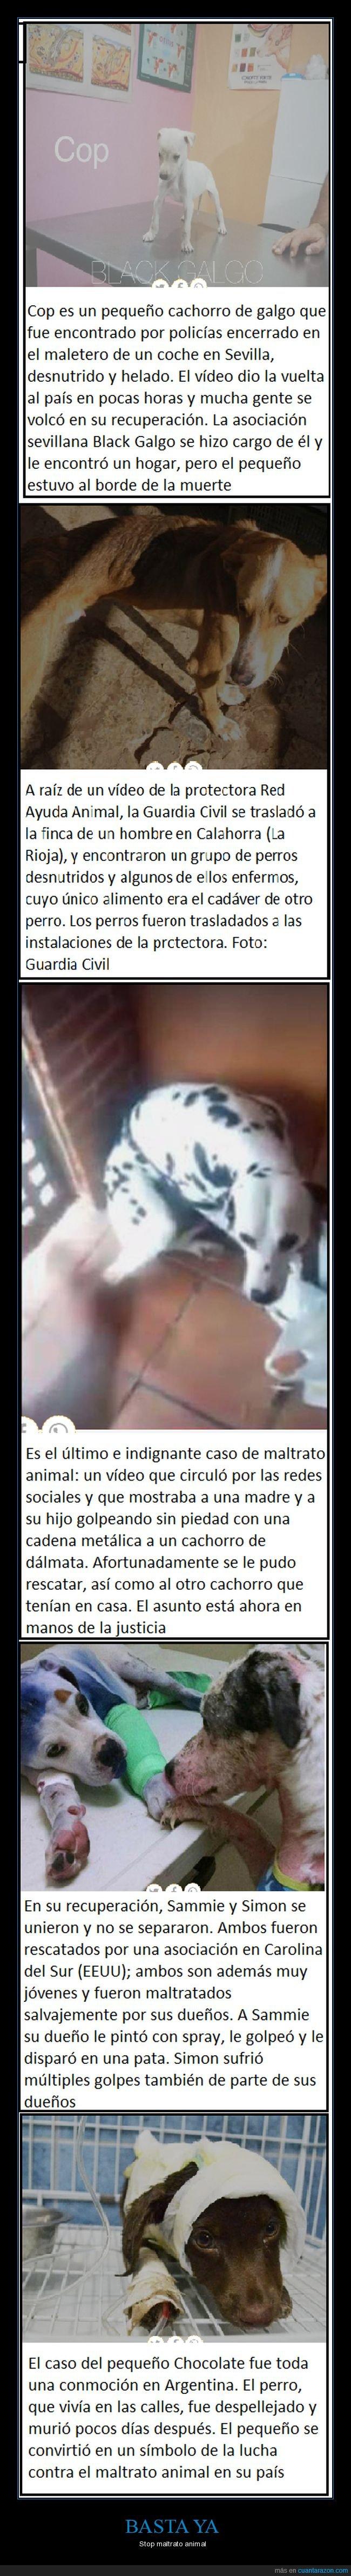 basta ya,stop maltrato animal